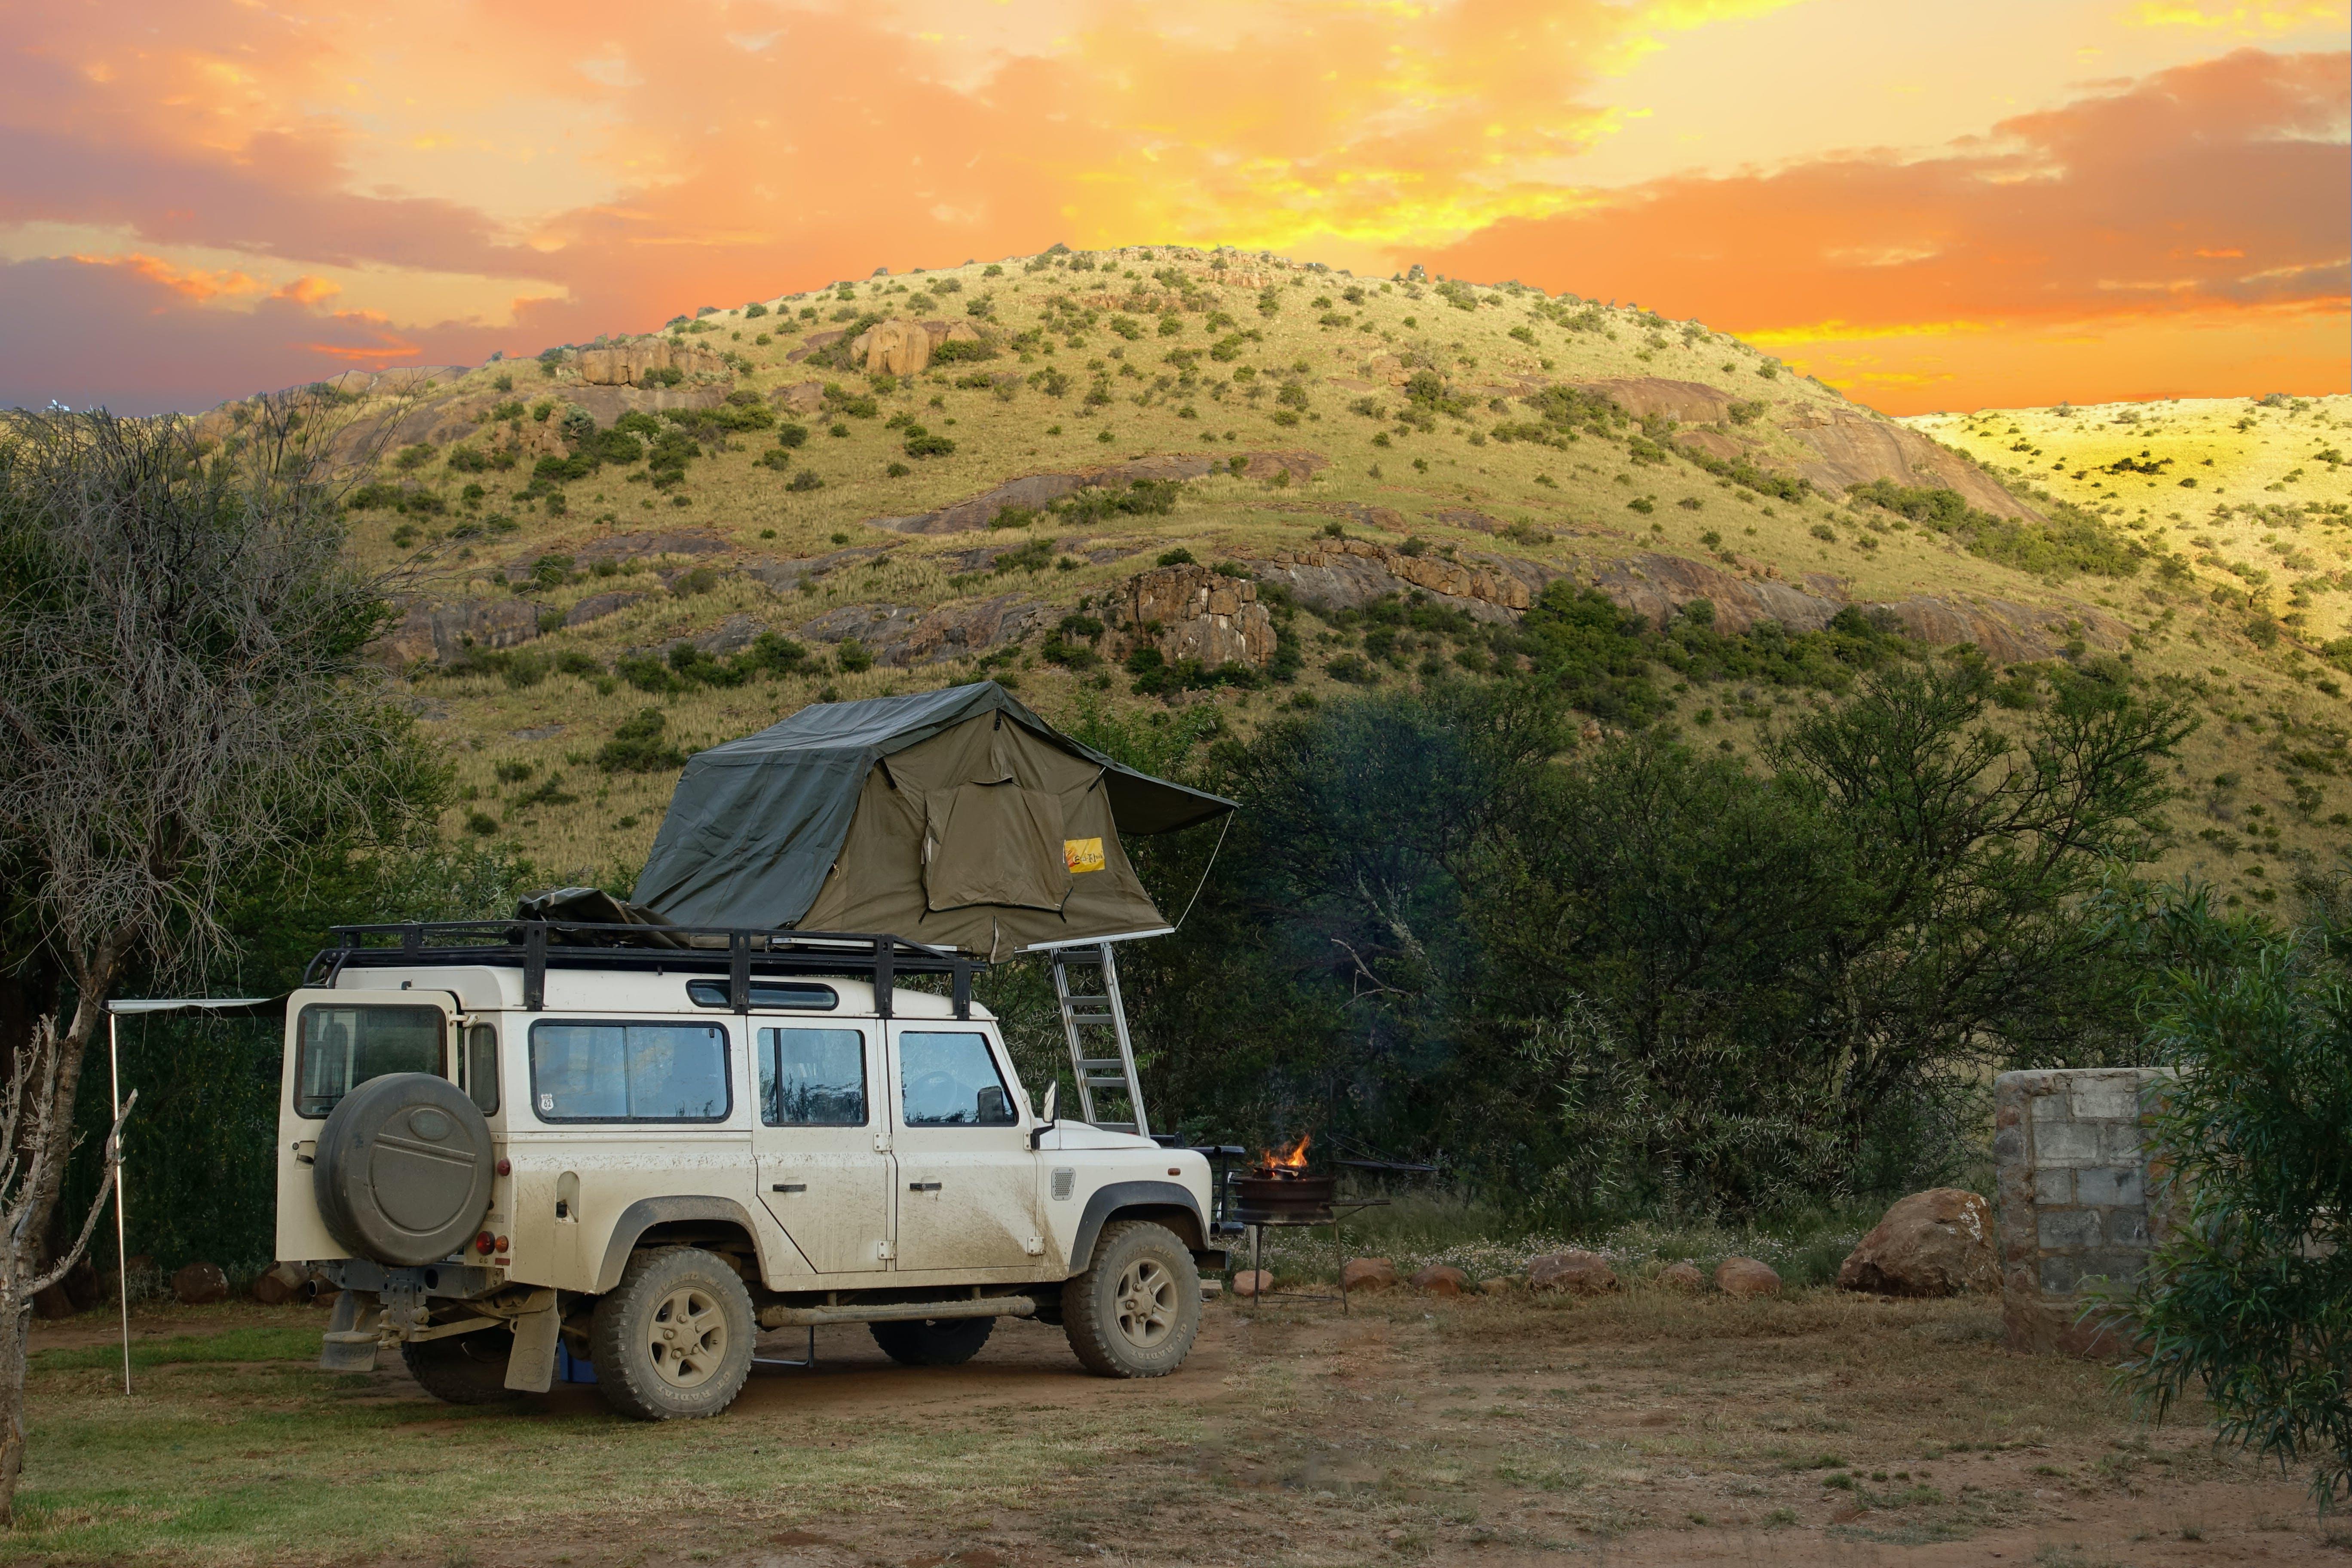 White Land Rover Defender in Jungle